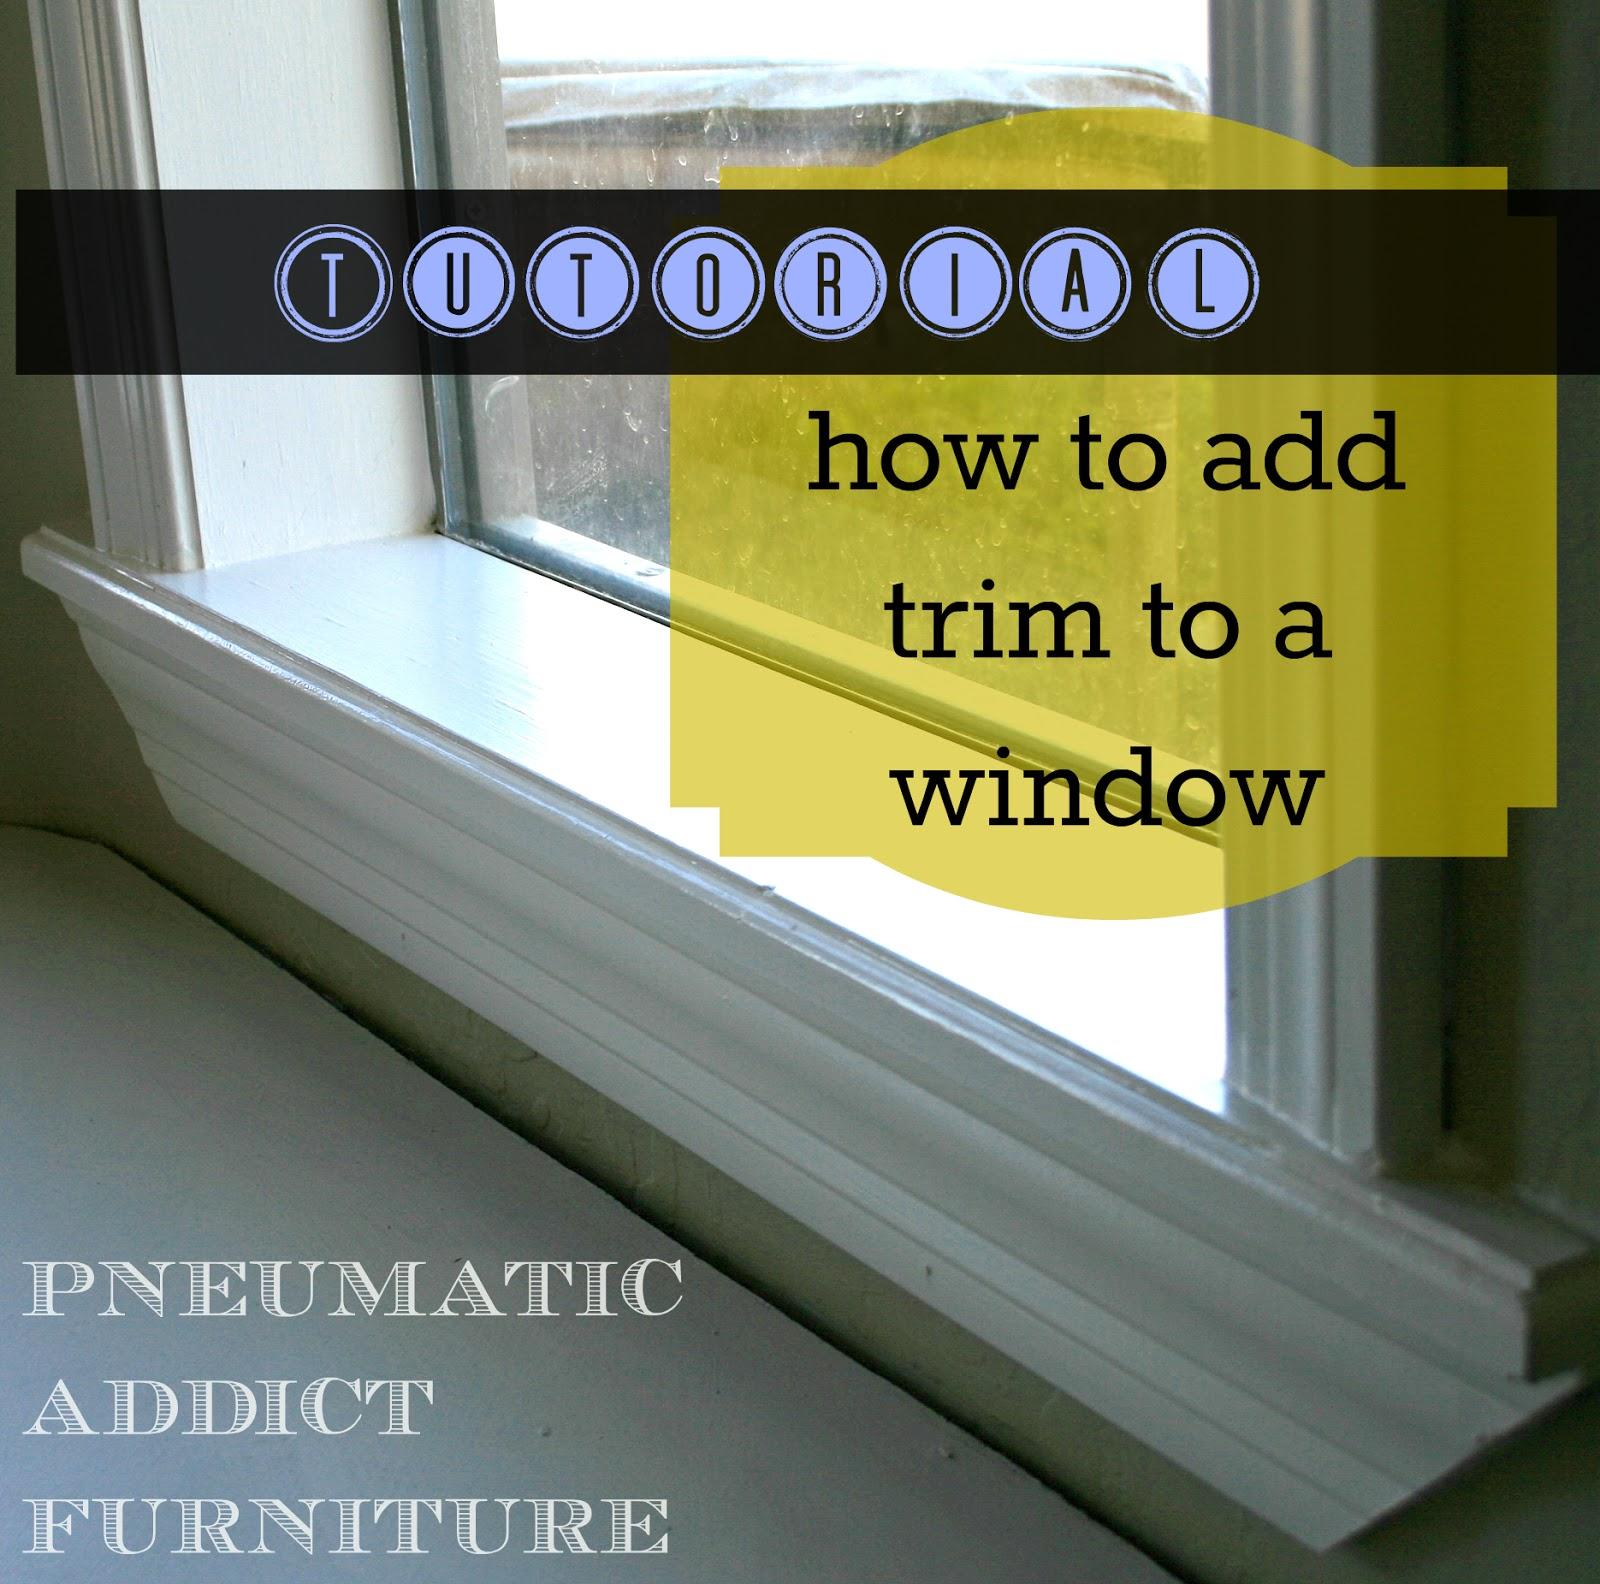 Diy interior window trim - Putting On Eyeliner Diy Window Trim